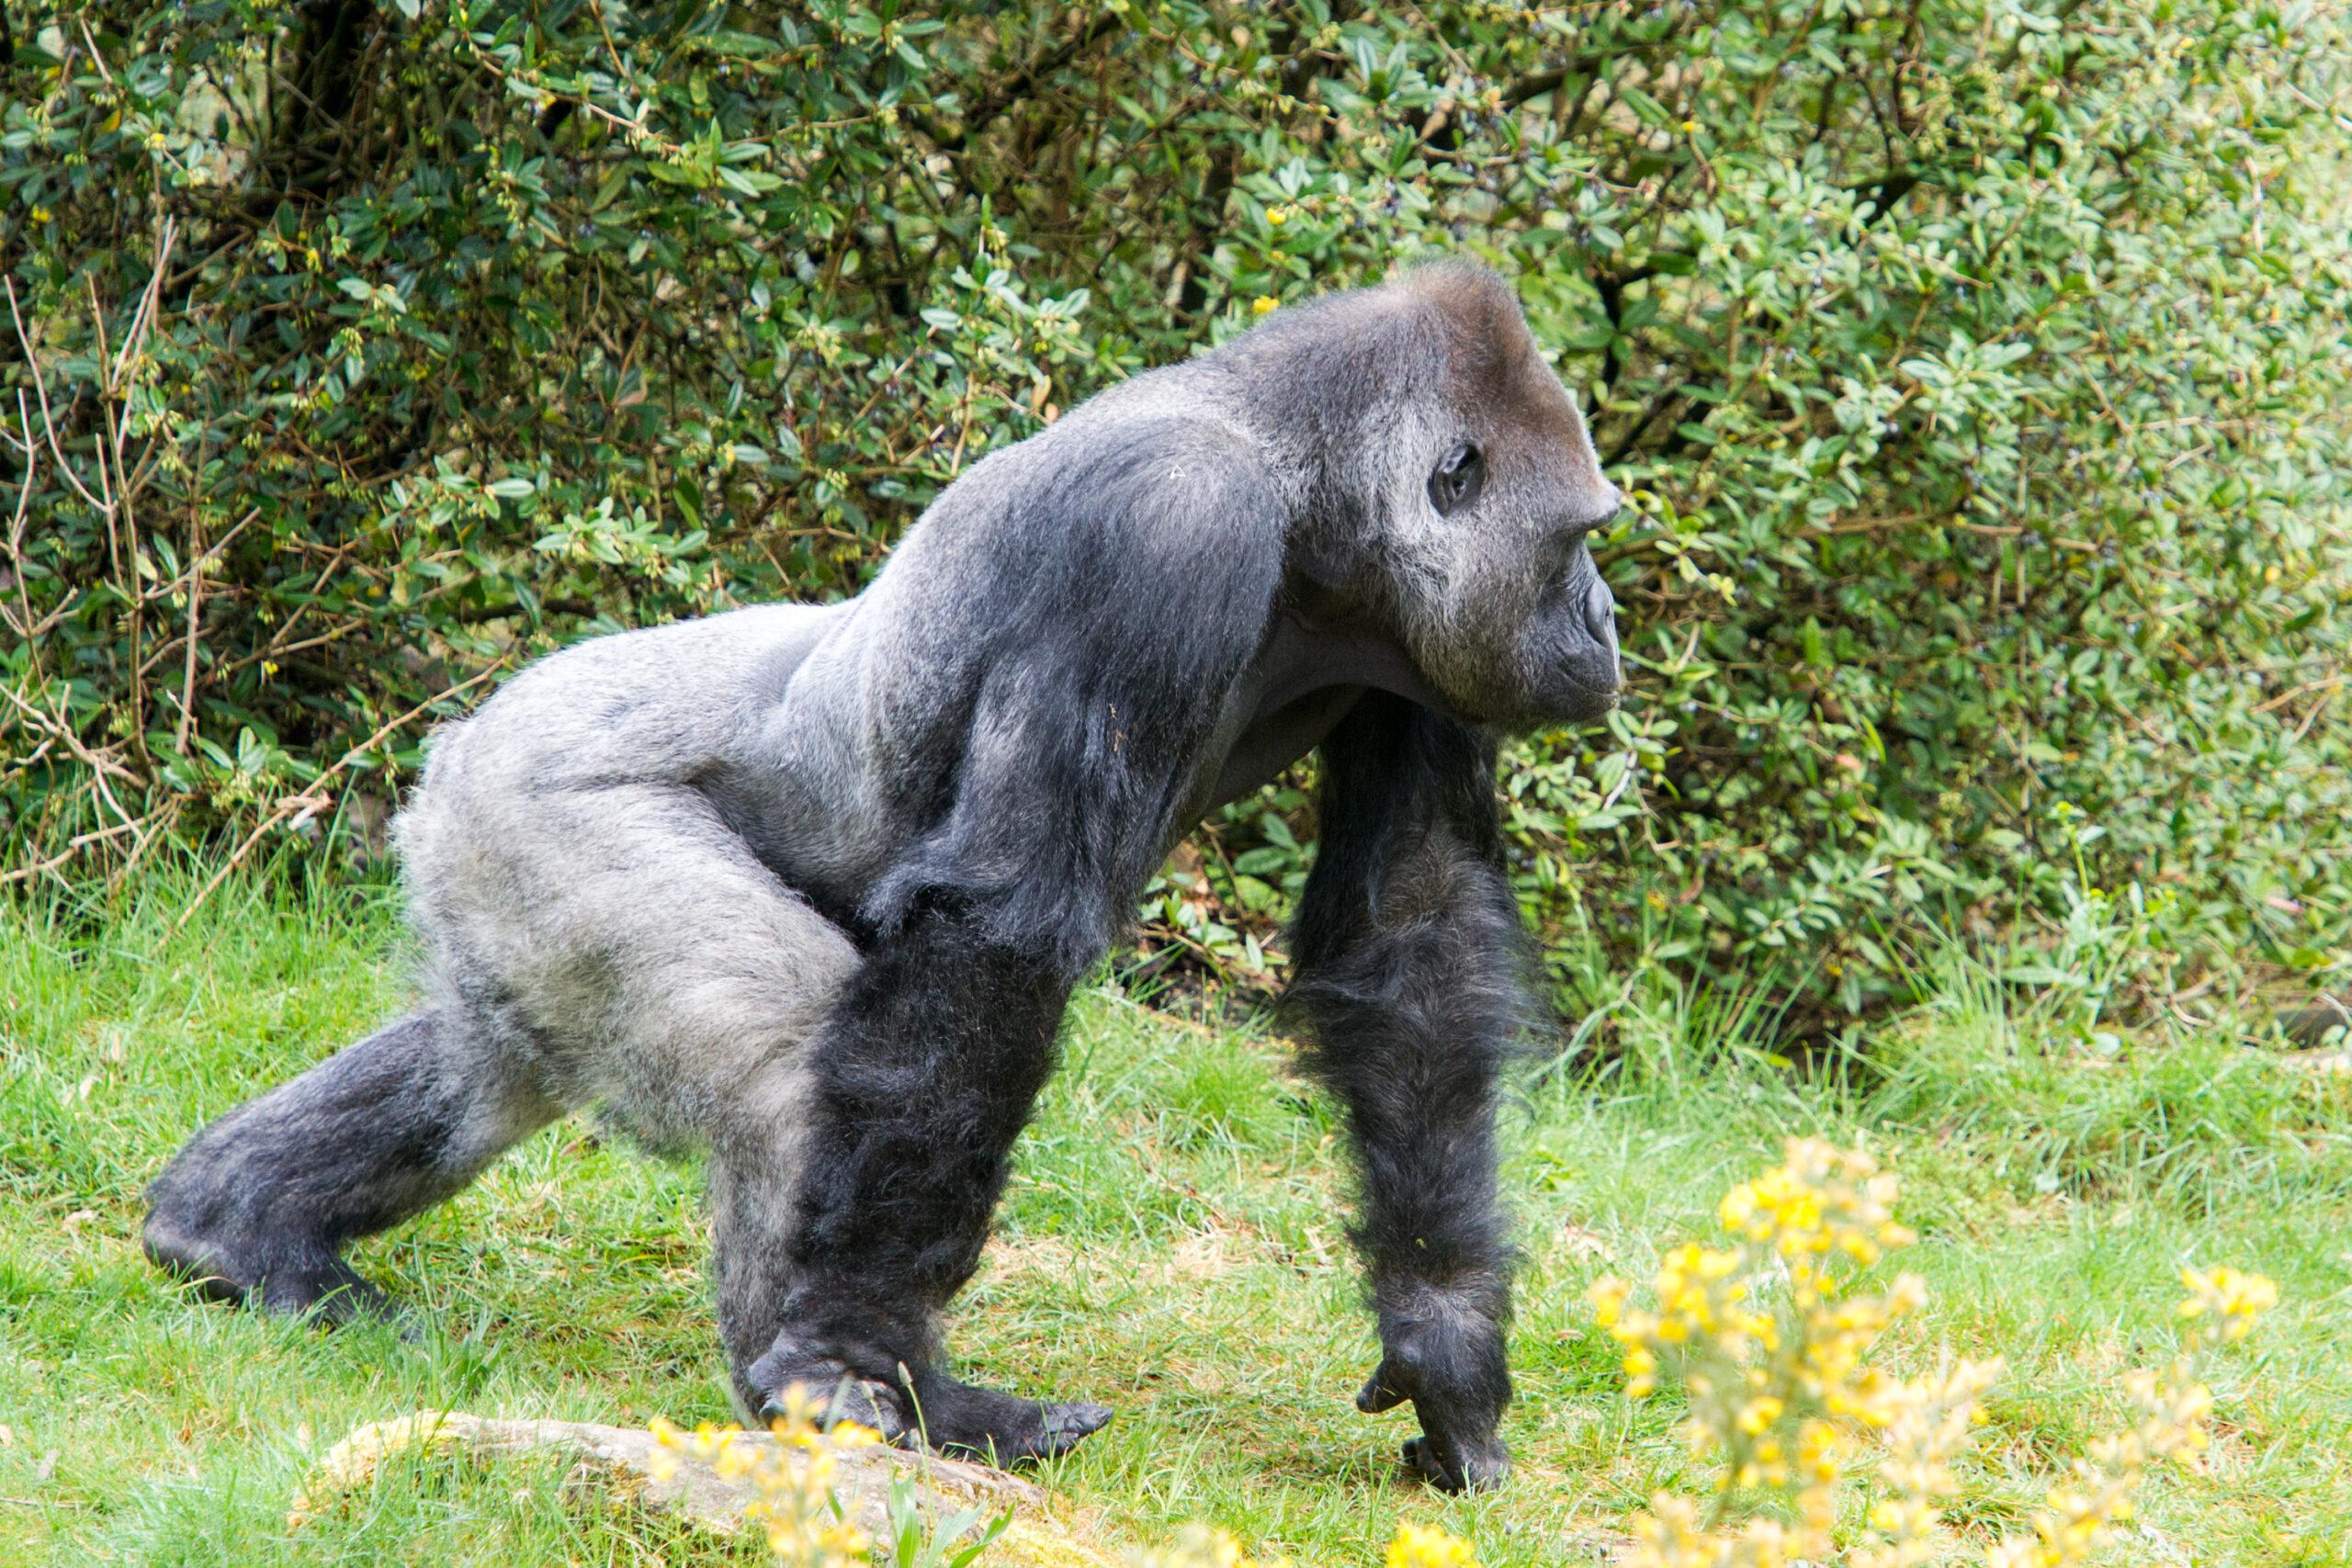 Gorillababy in Apenheul op komst